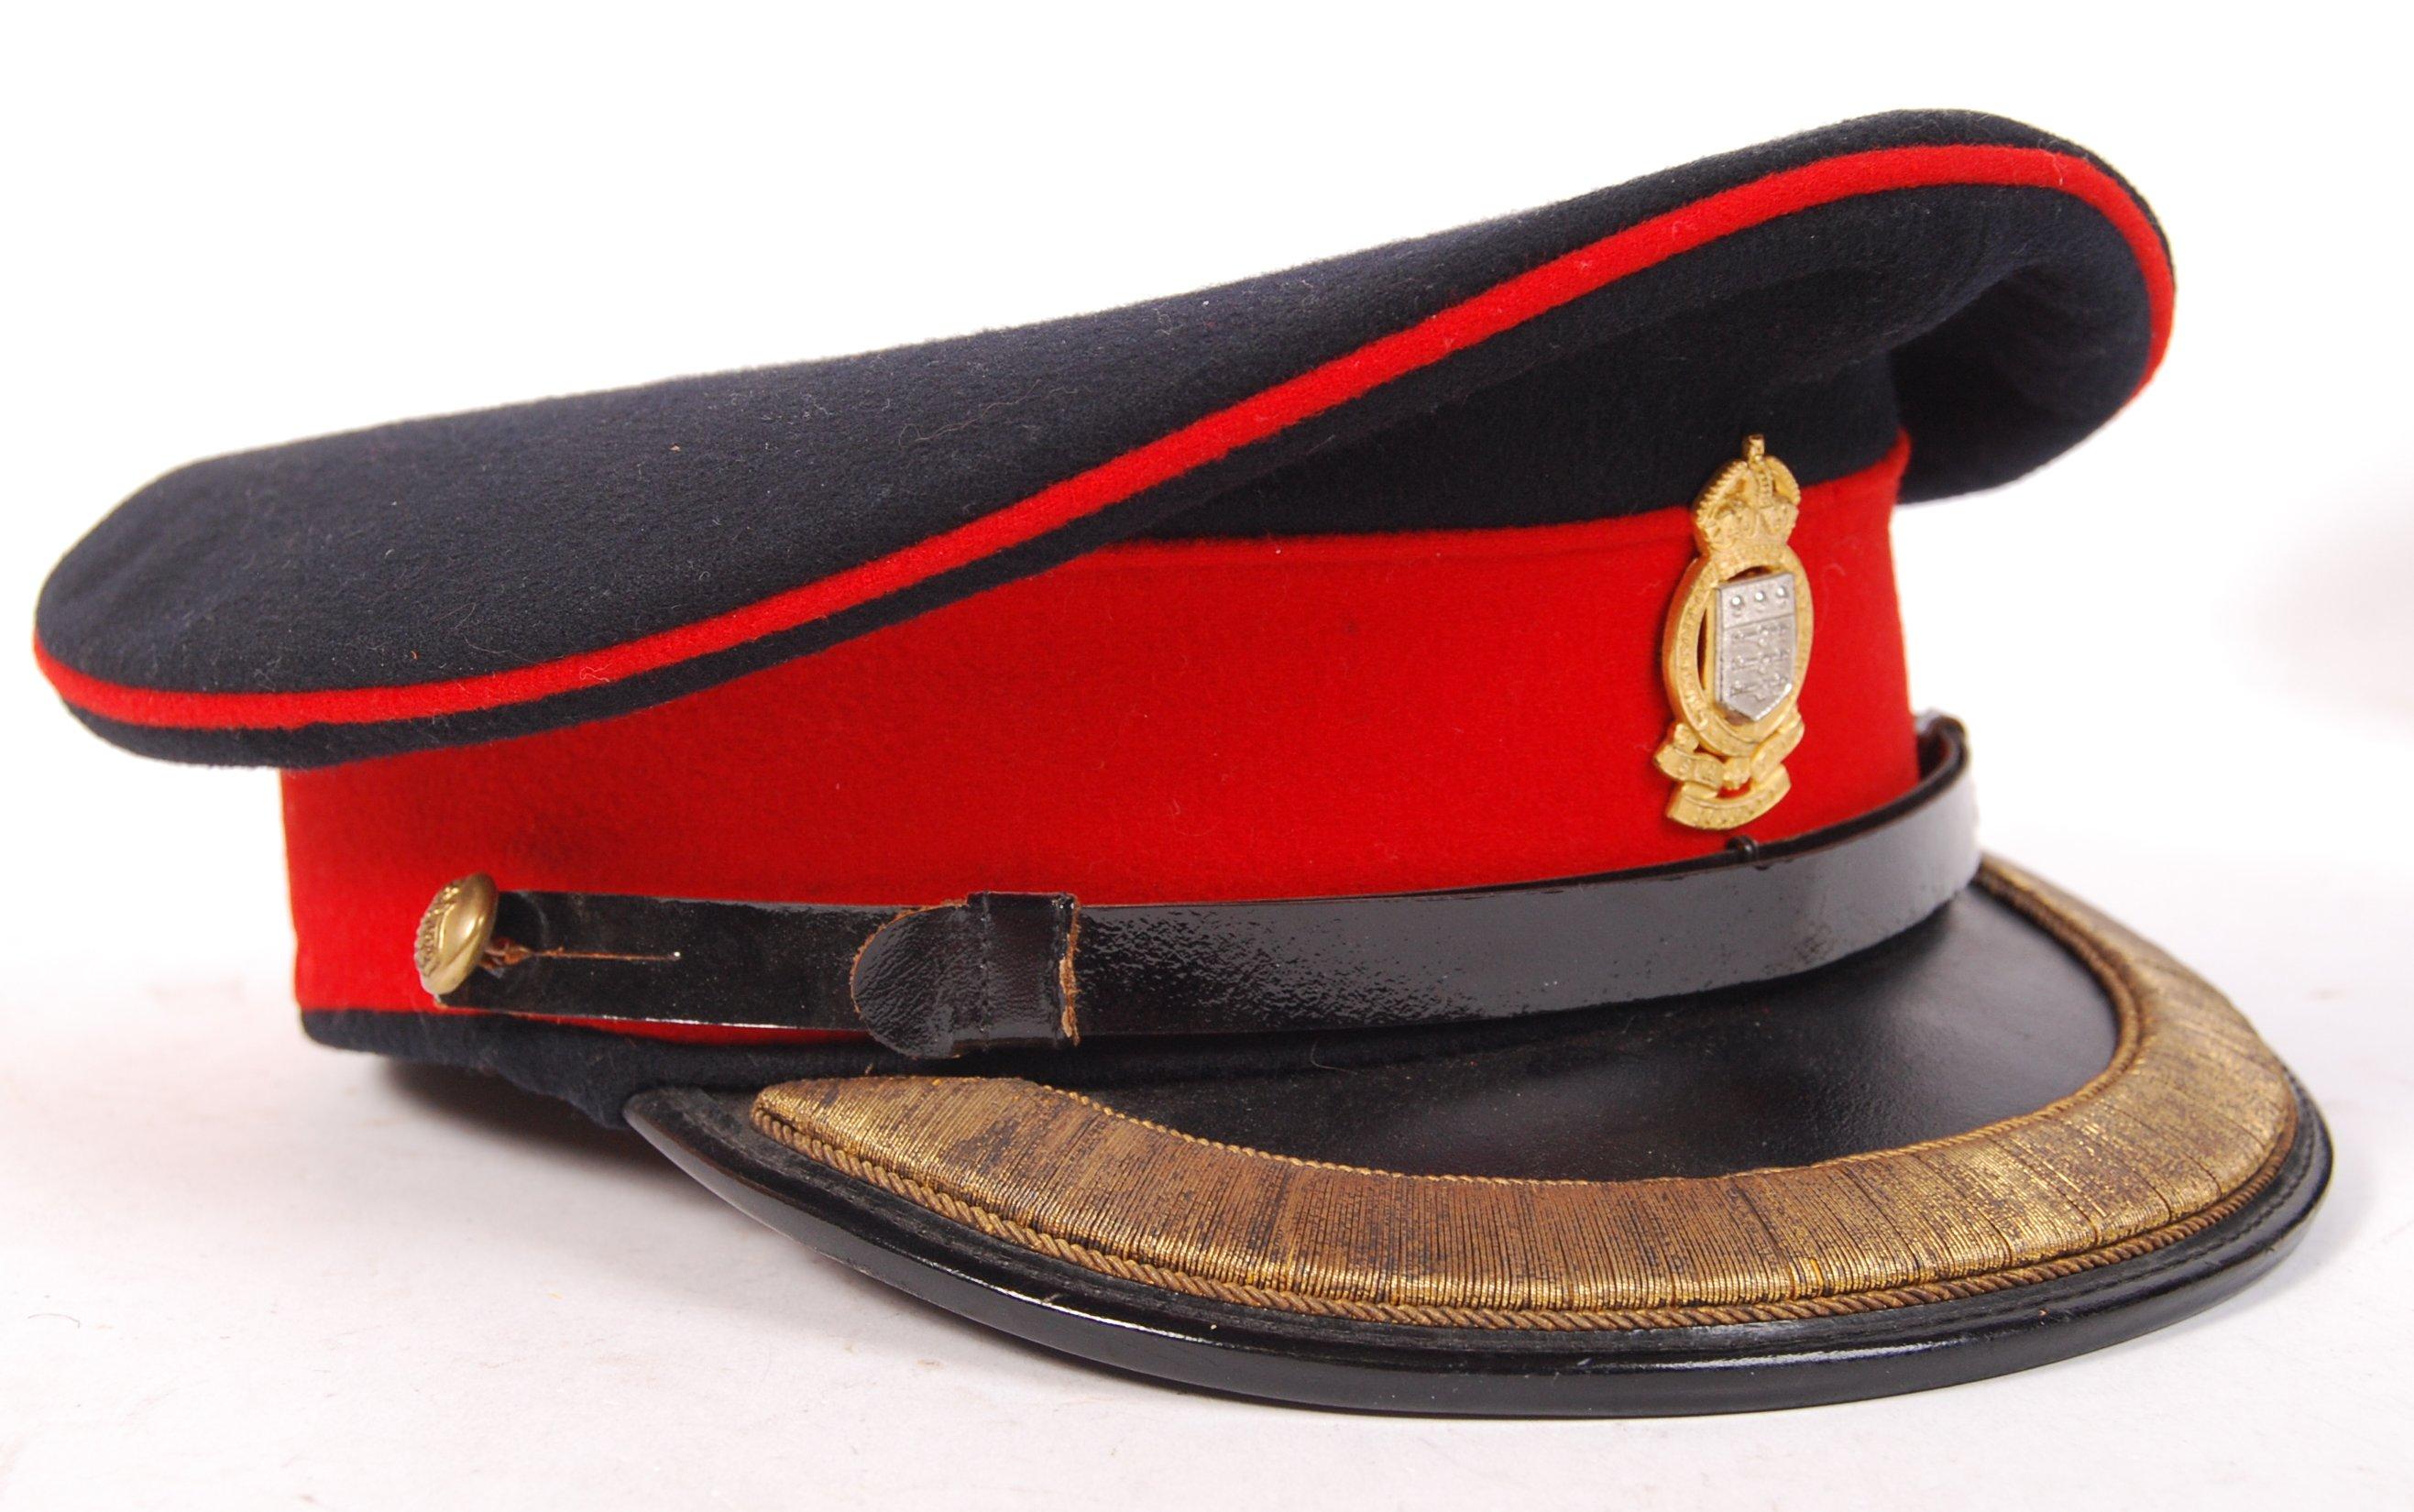 POST-WWII SECOND WORLD WAR RAOC OFFICER'S DRESS CA